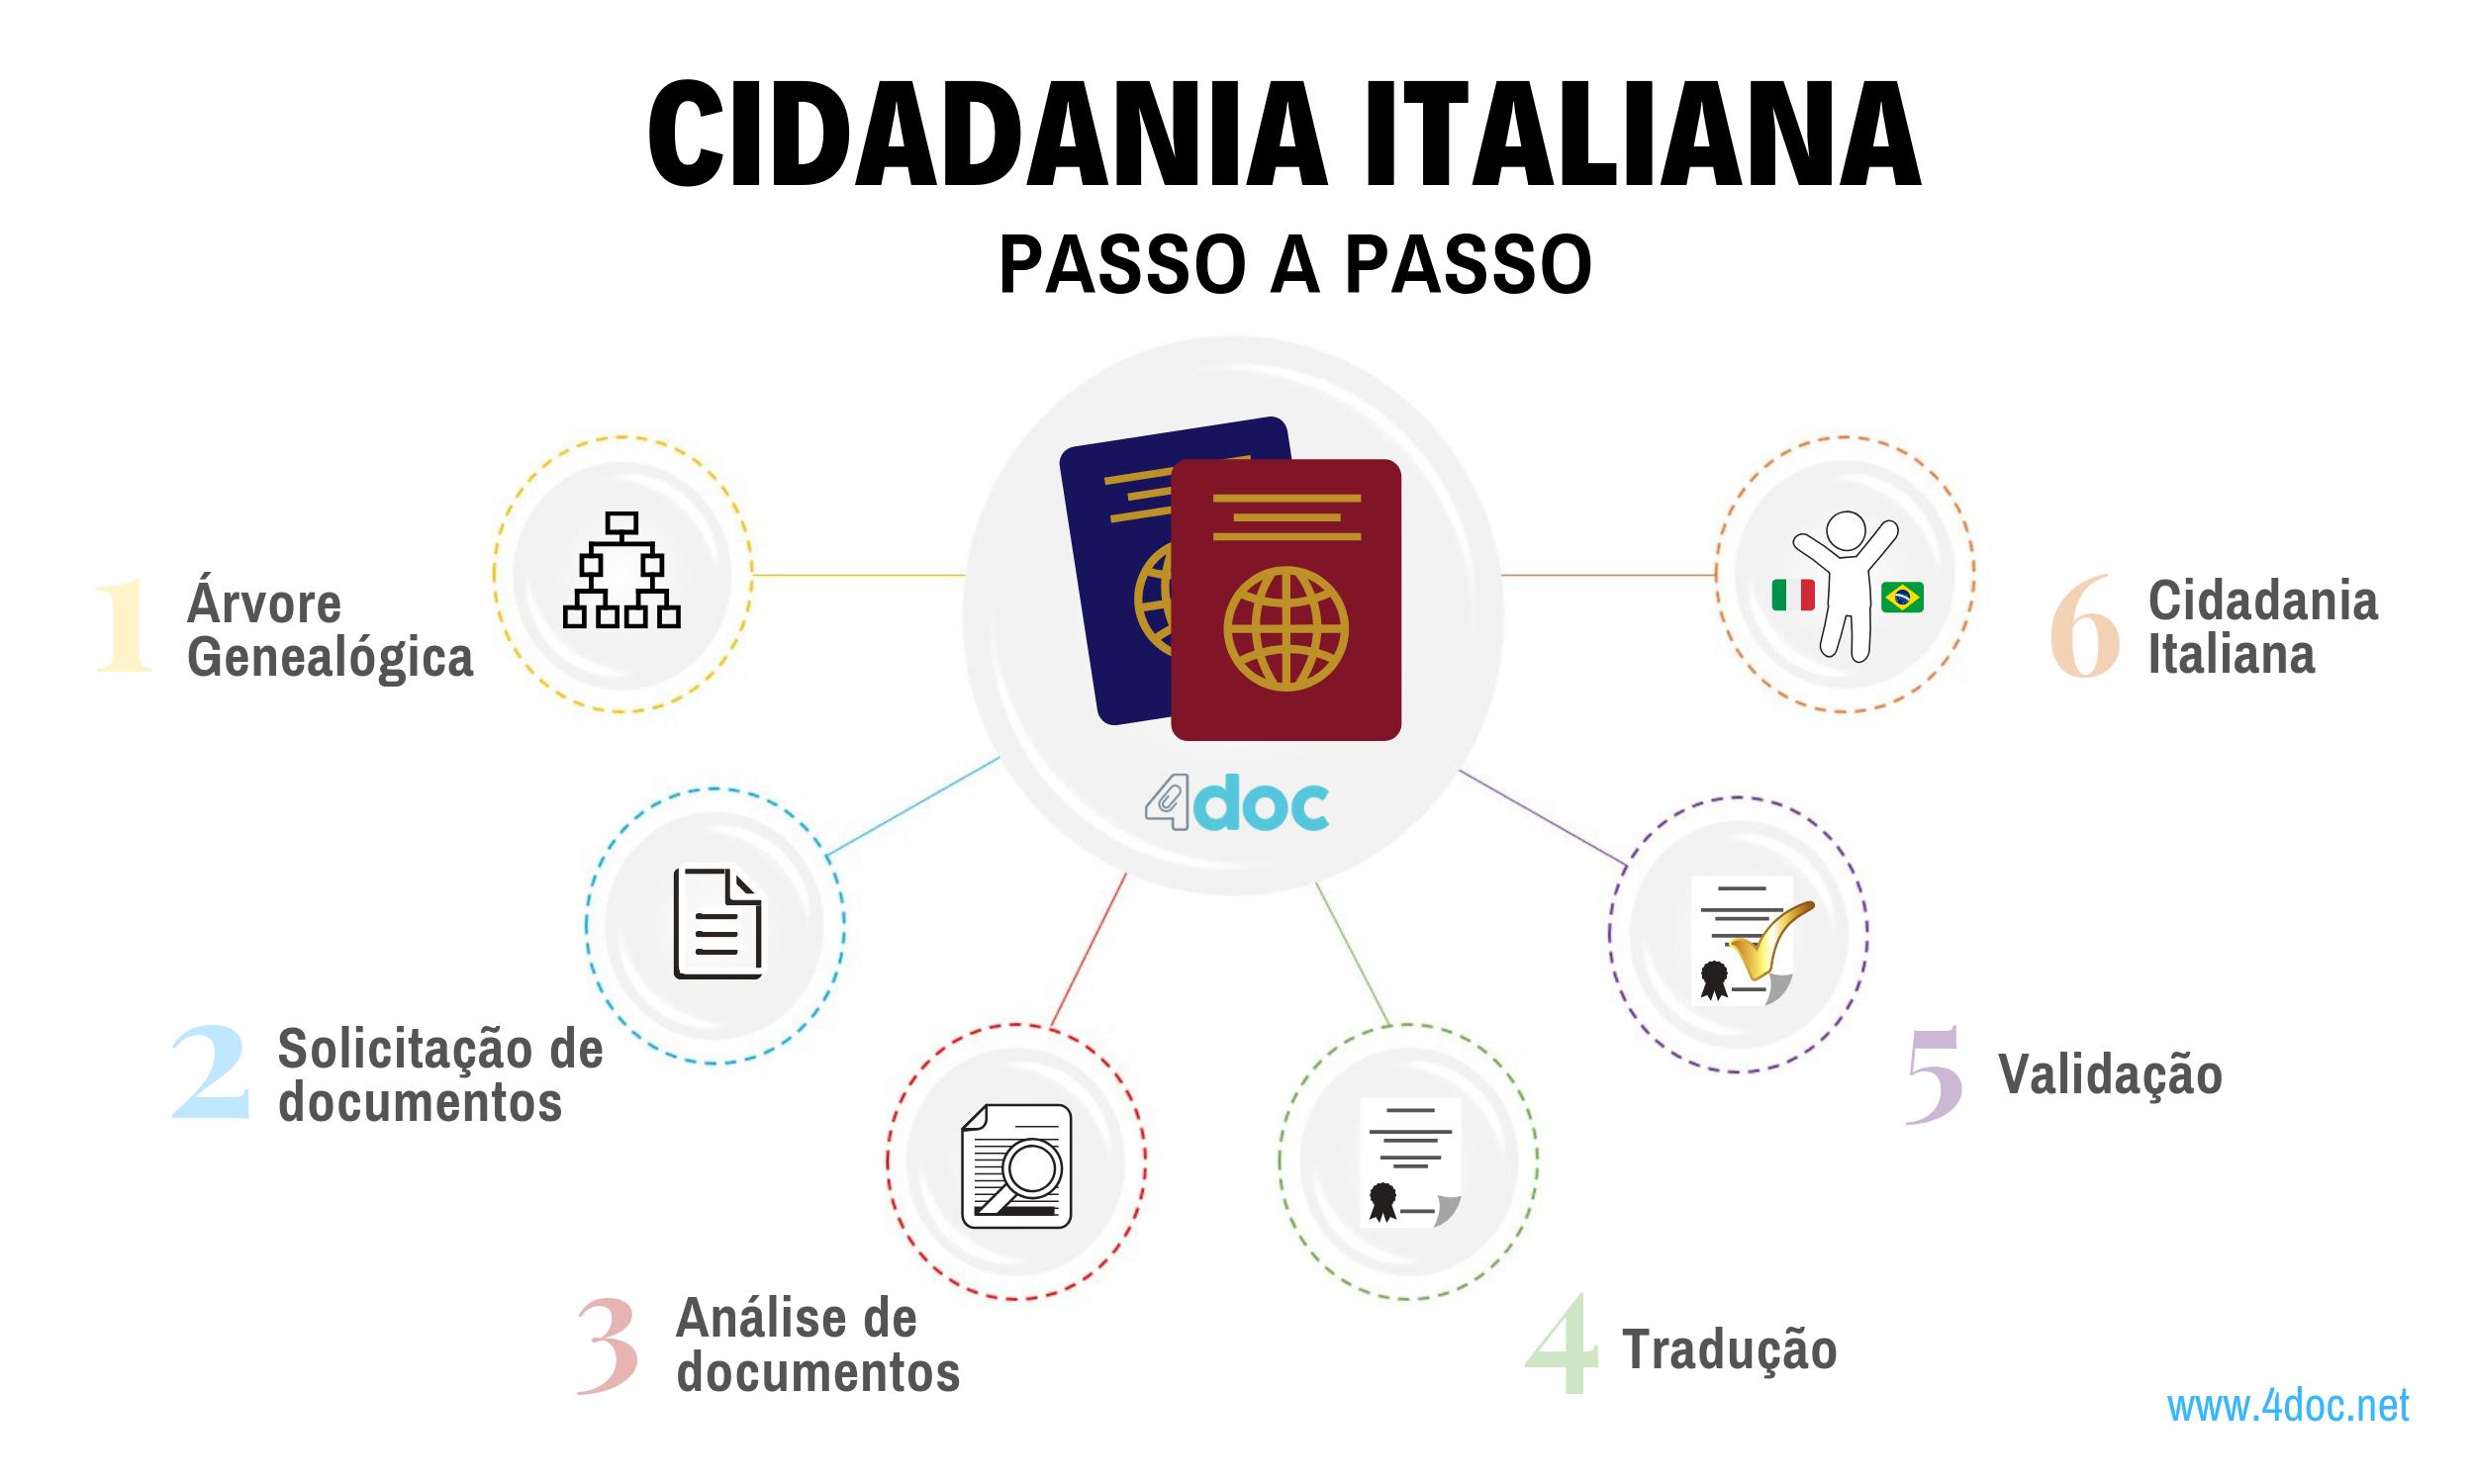 Cidadania Italiana passo a passo infografico